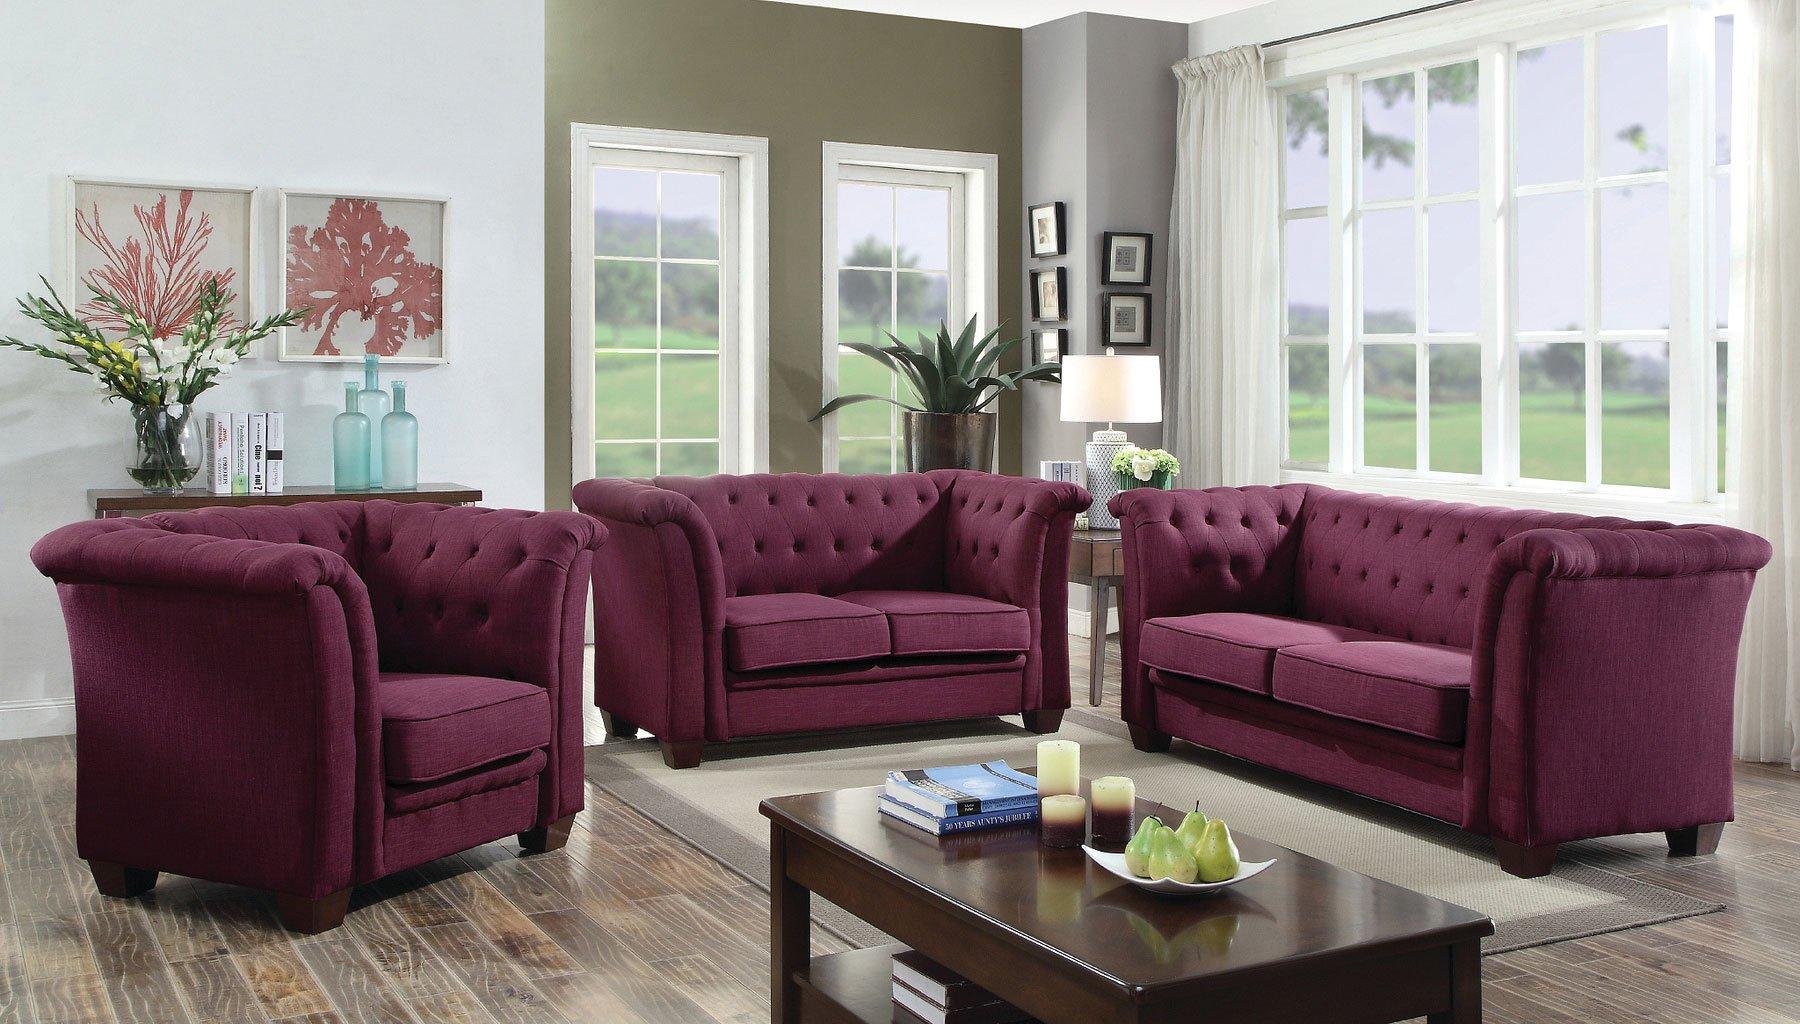 G326 Tufted Living Room Set (Purple) Glory Furniture